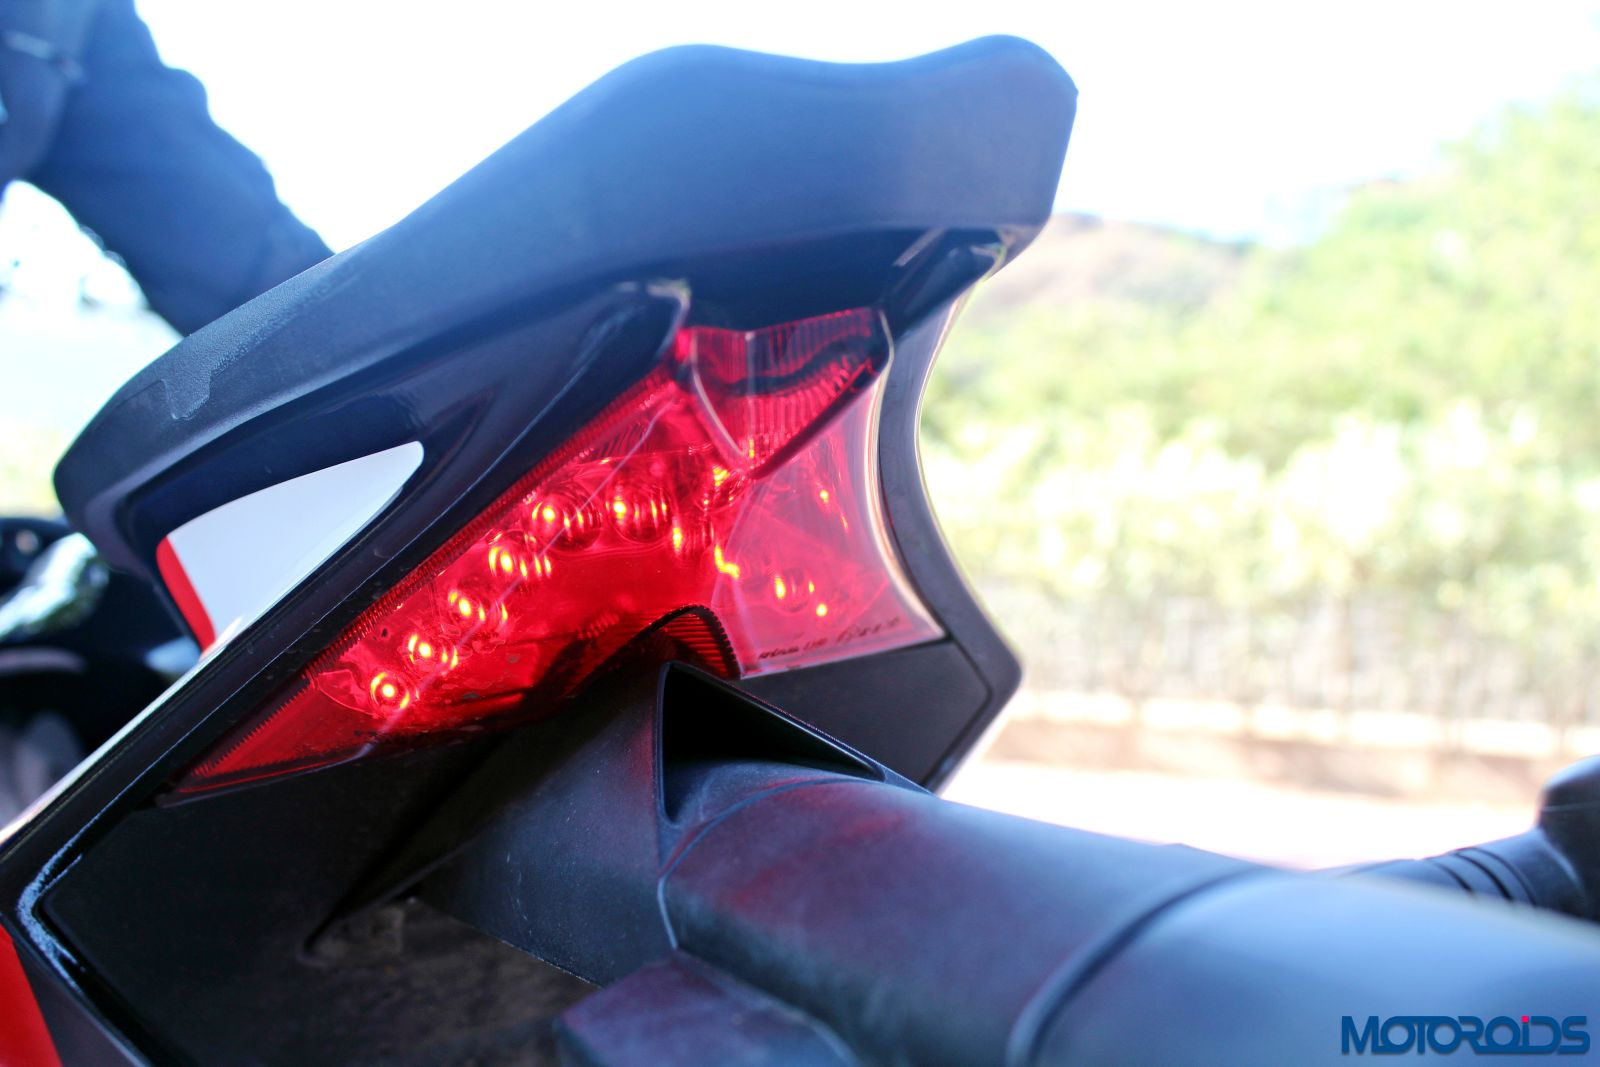 Aprilia Tuono V4 1100 Factory Review - Details and Stills (168)